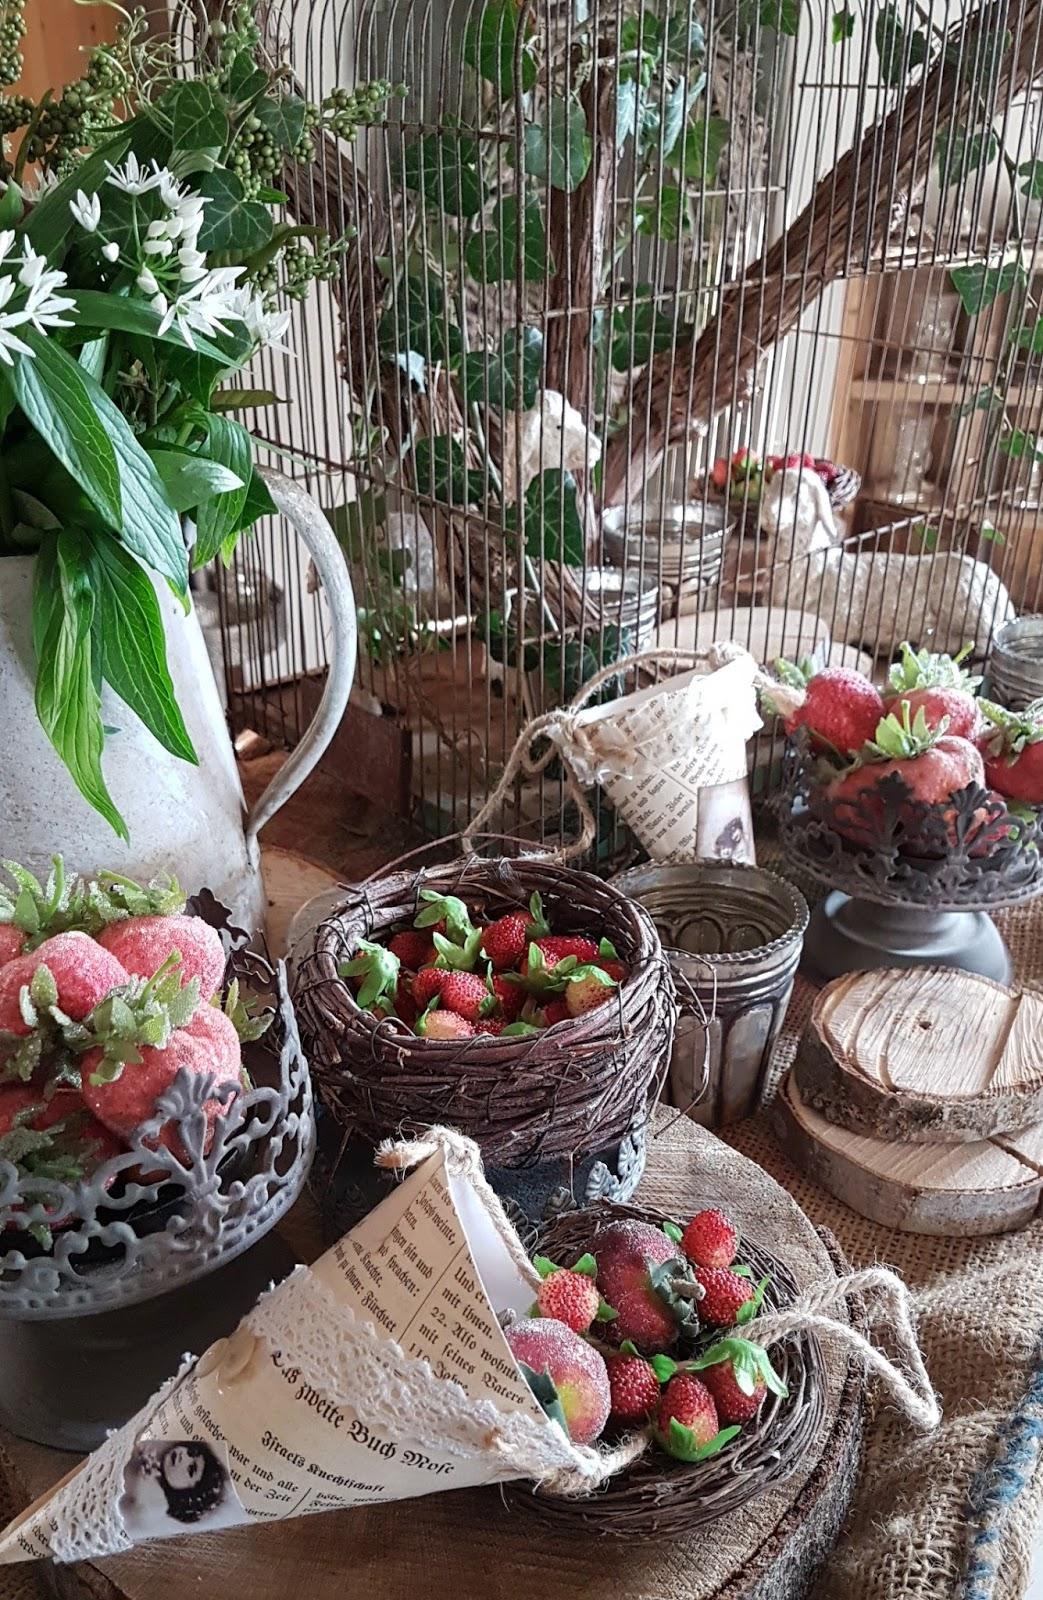 Shabby house and garden schafe und erdbeeren for Dekoration erdbeeren